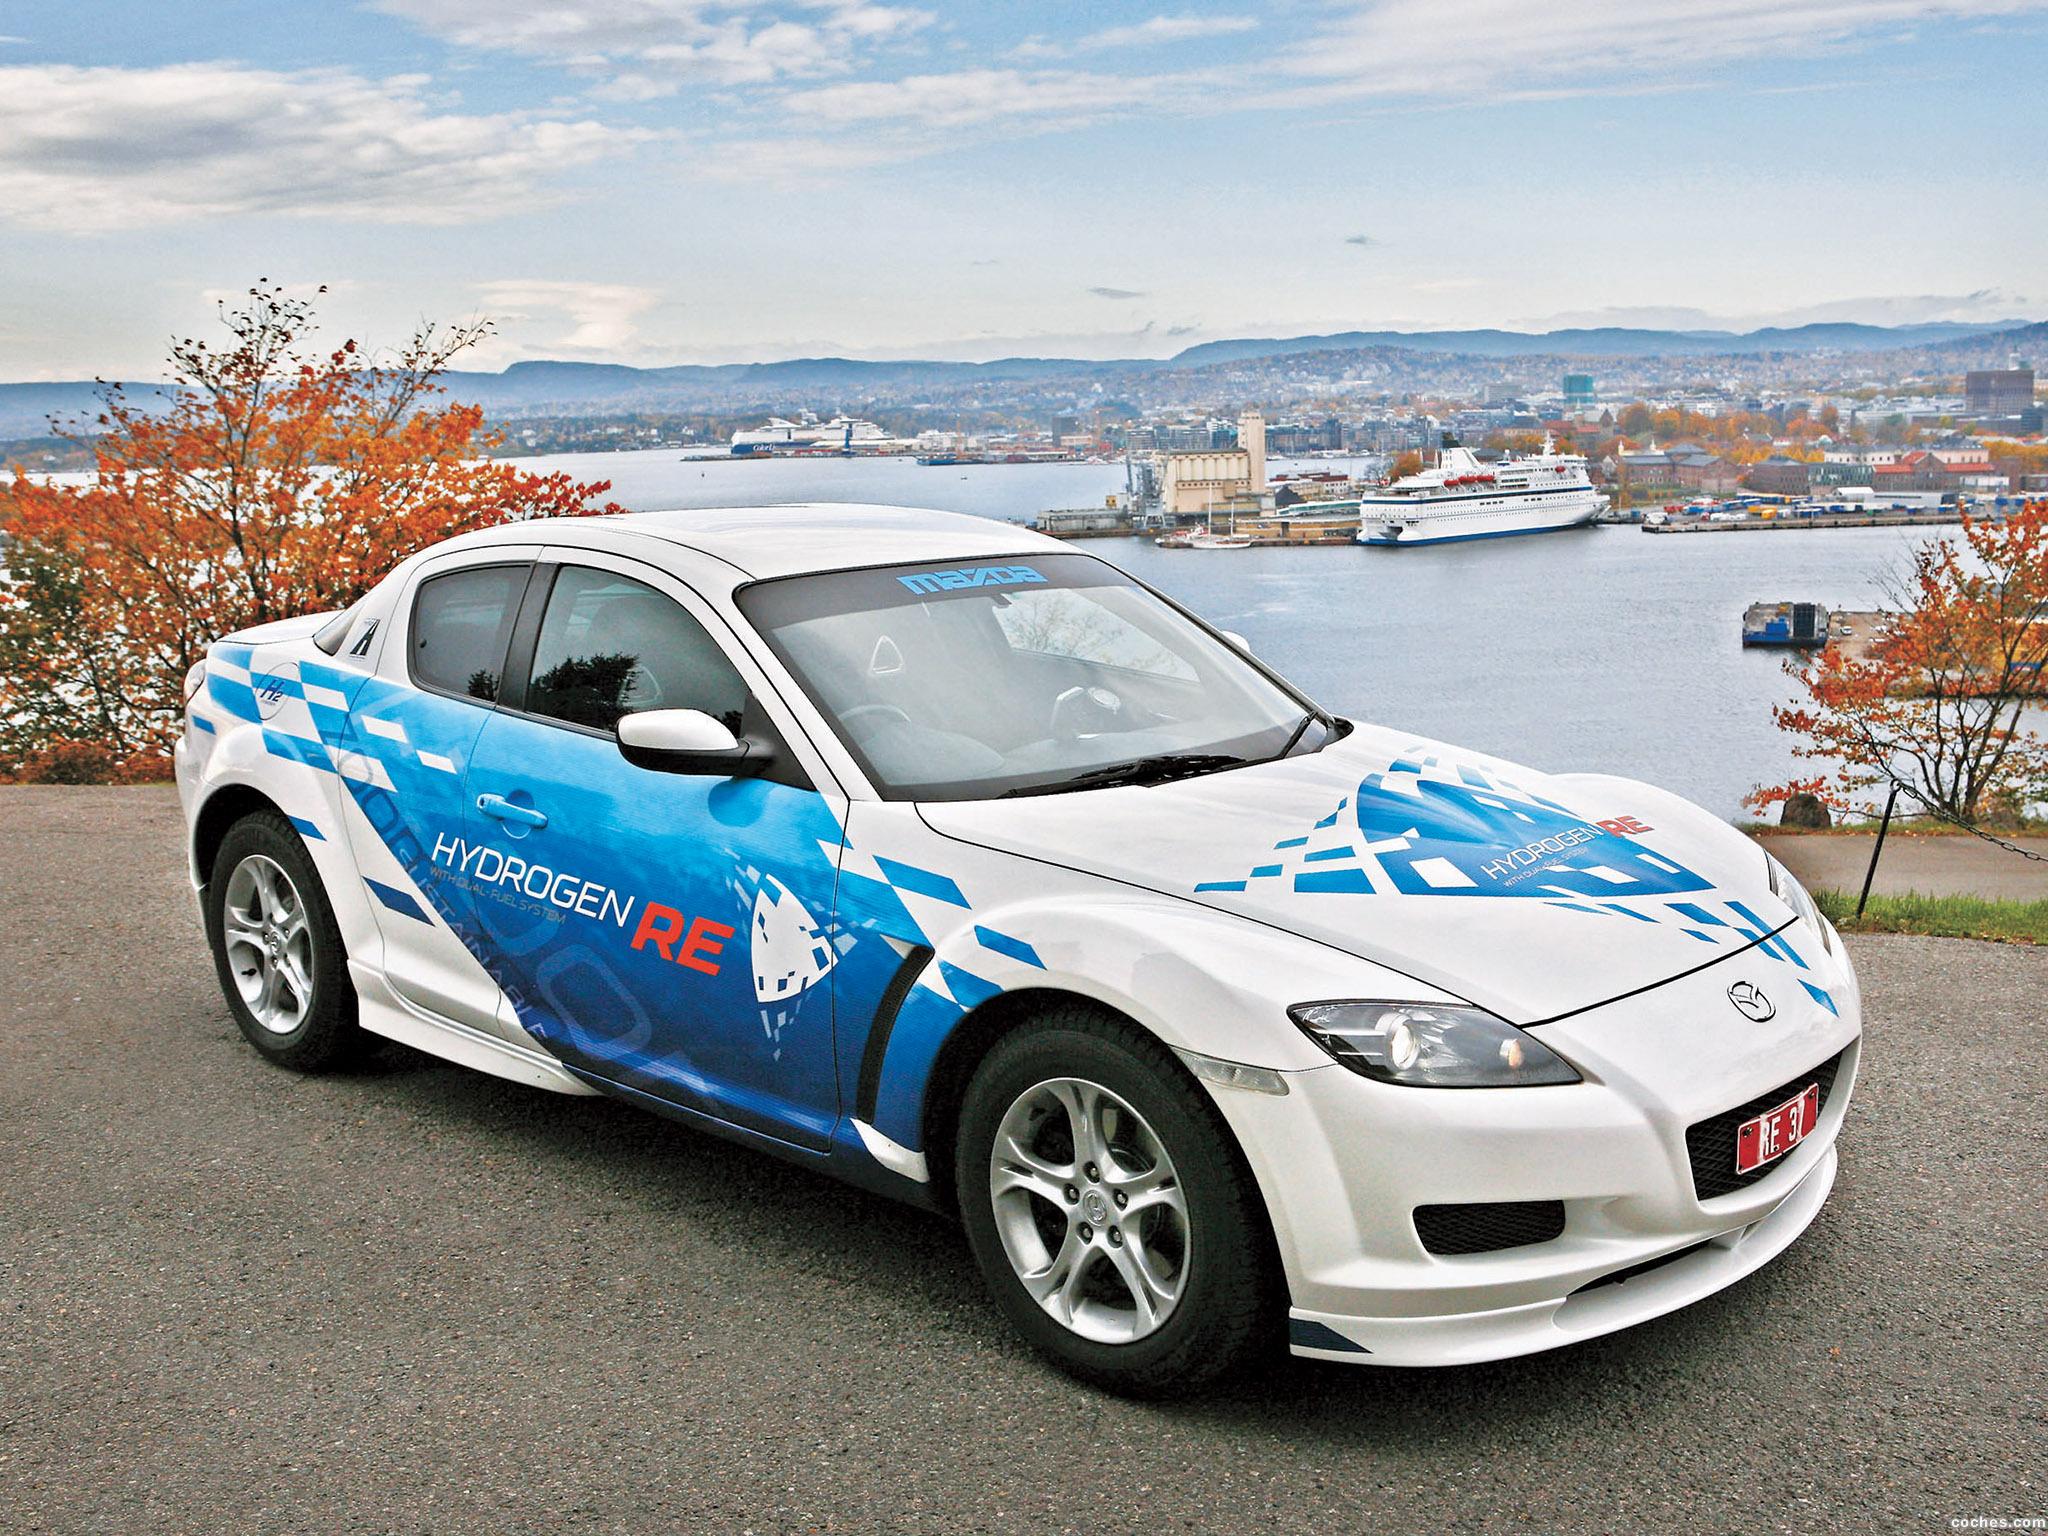 Foto 0 de Mazda RX-8 Hydrogen Re Dual Fuel System 2009